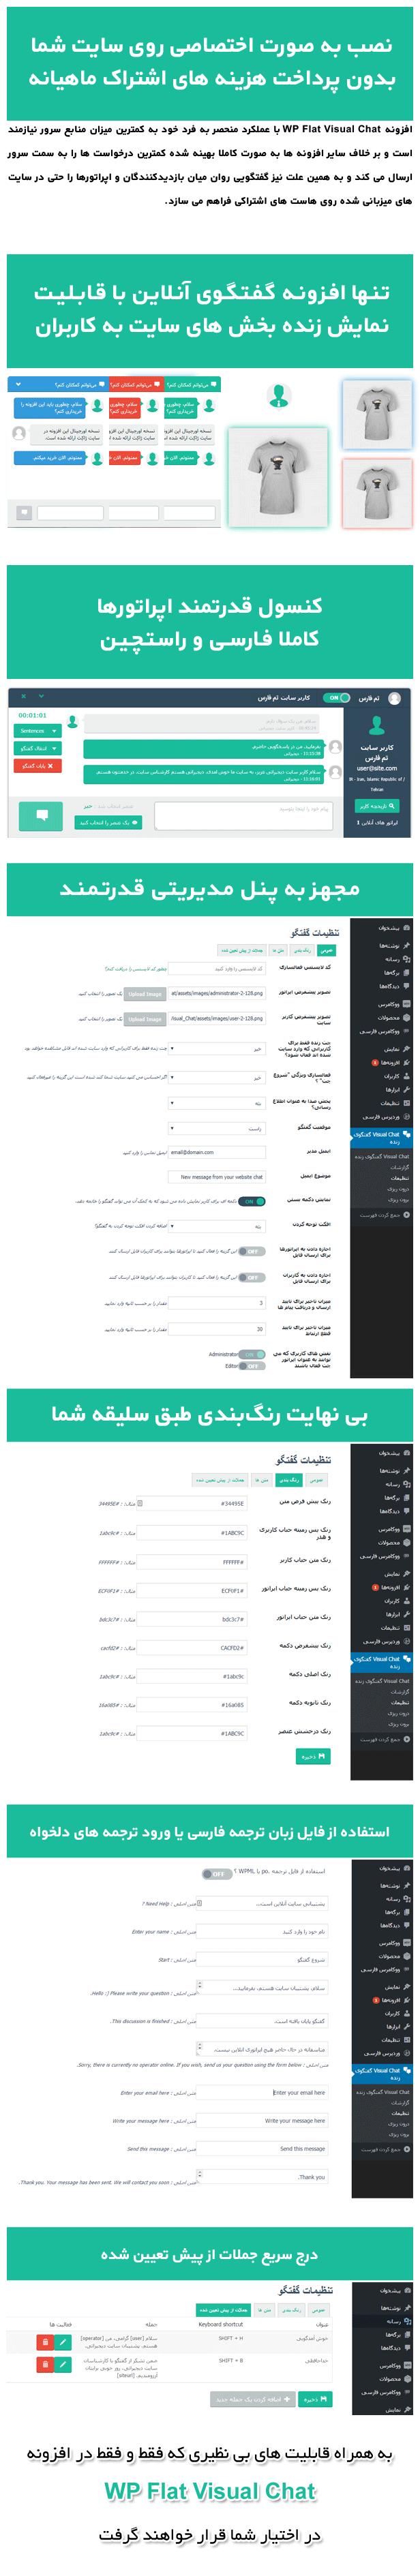 افزونه Visual Chat